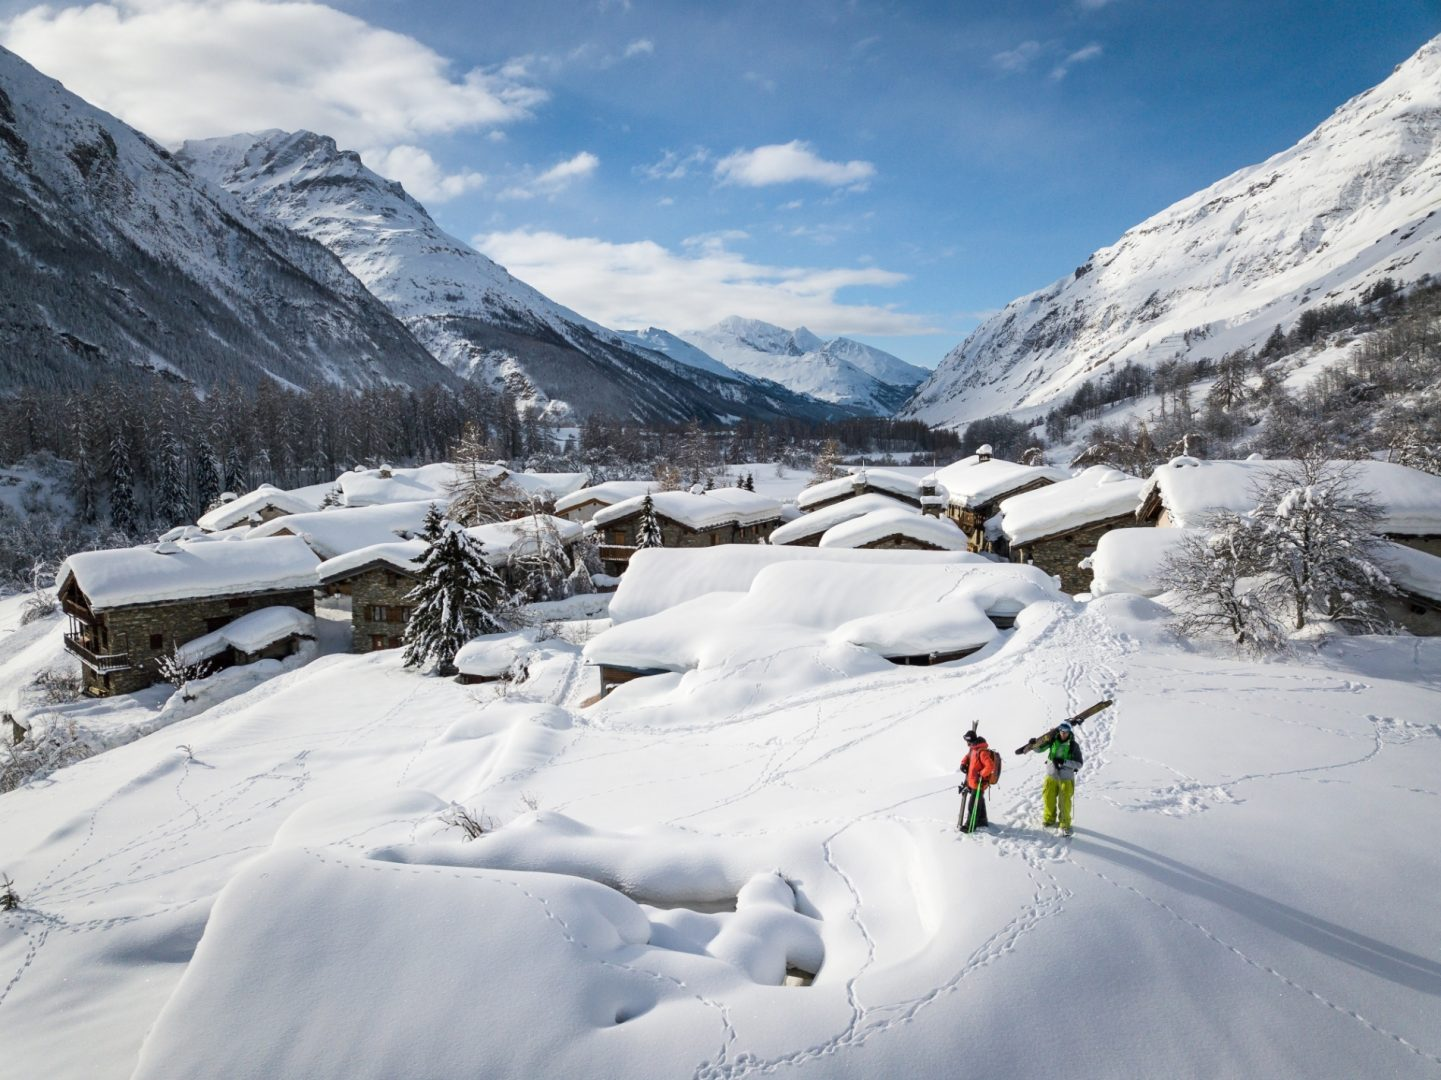 paysage neige savoie